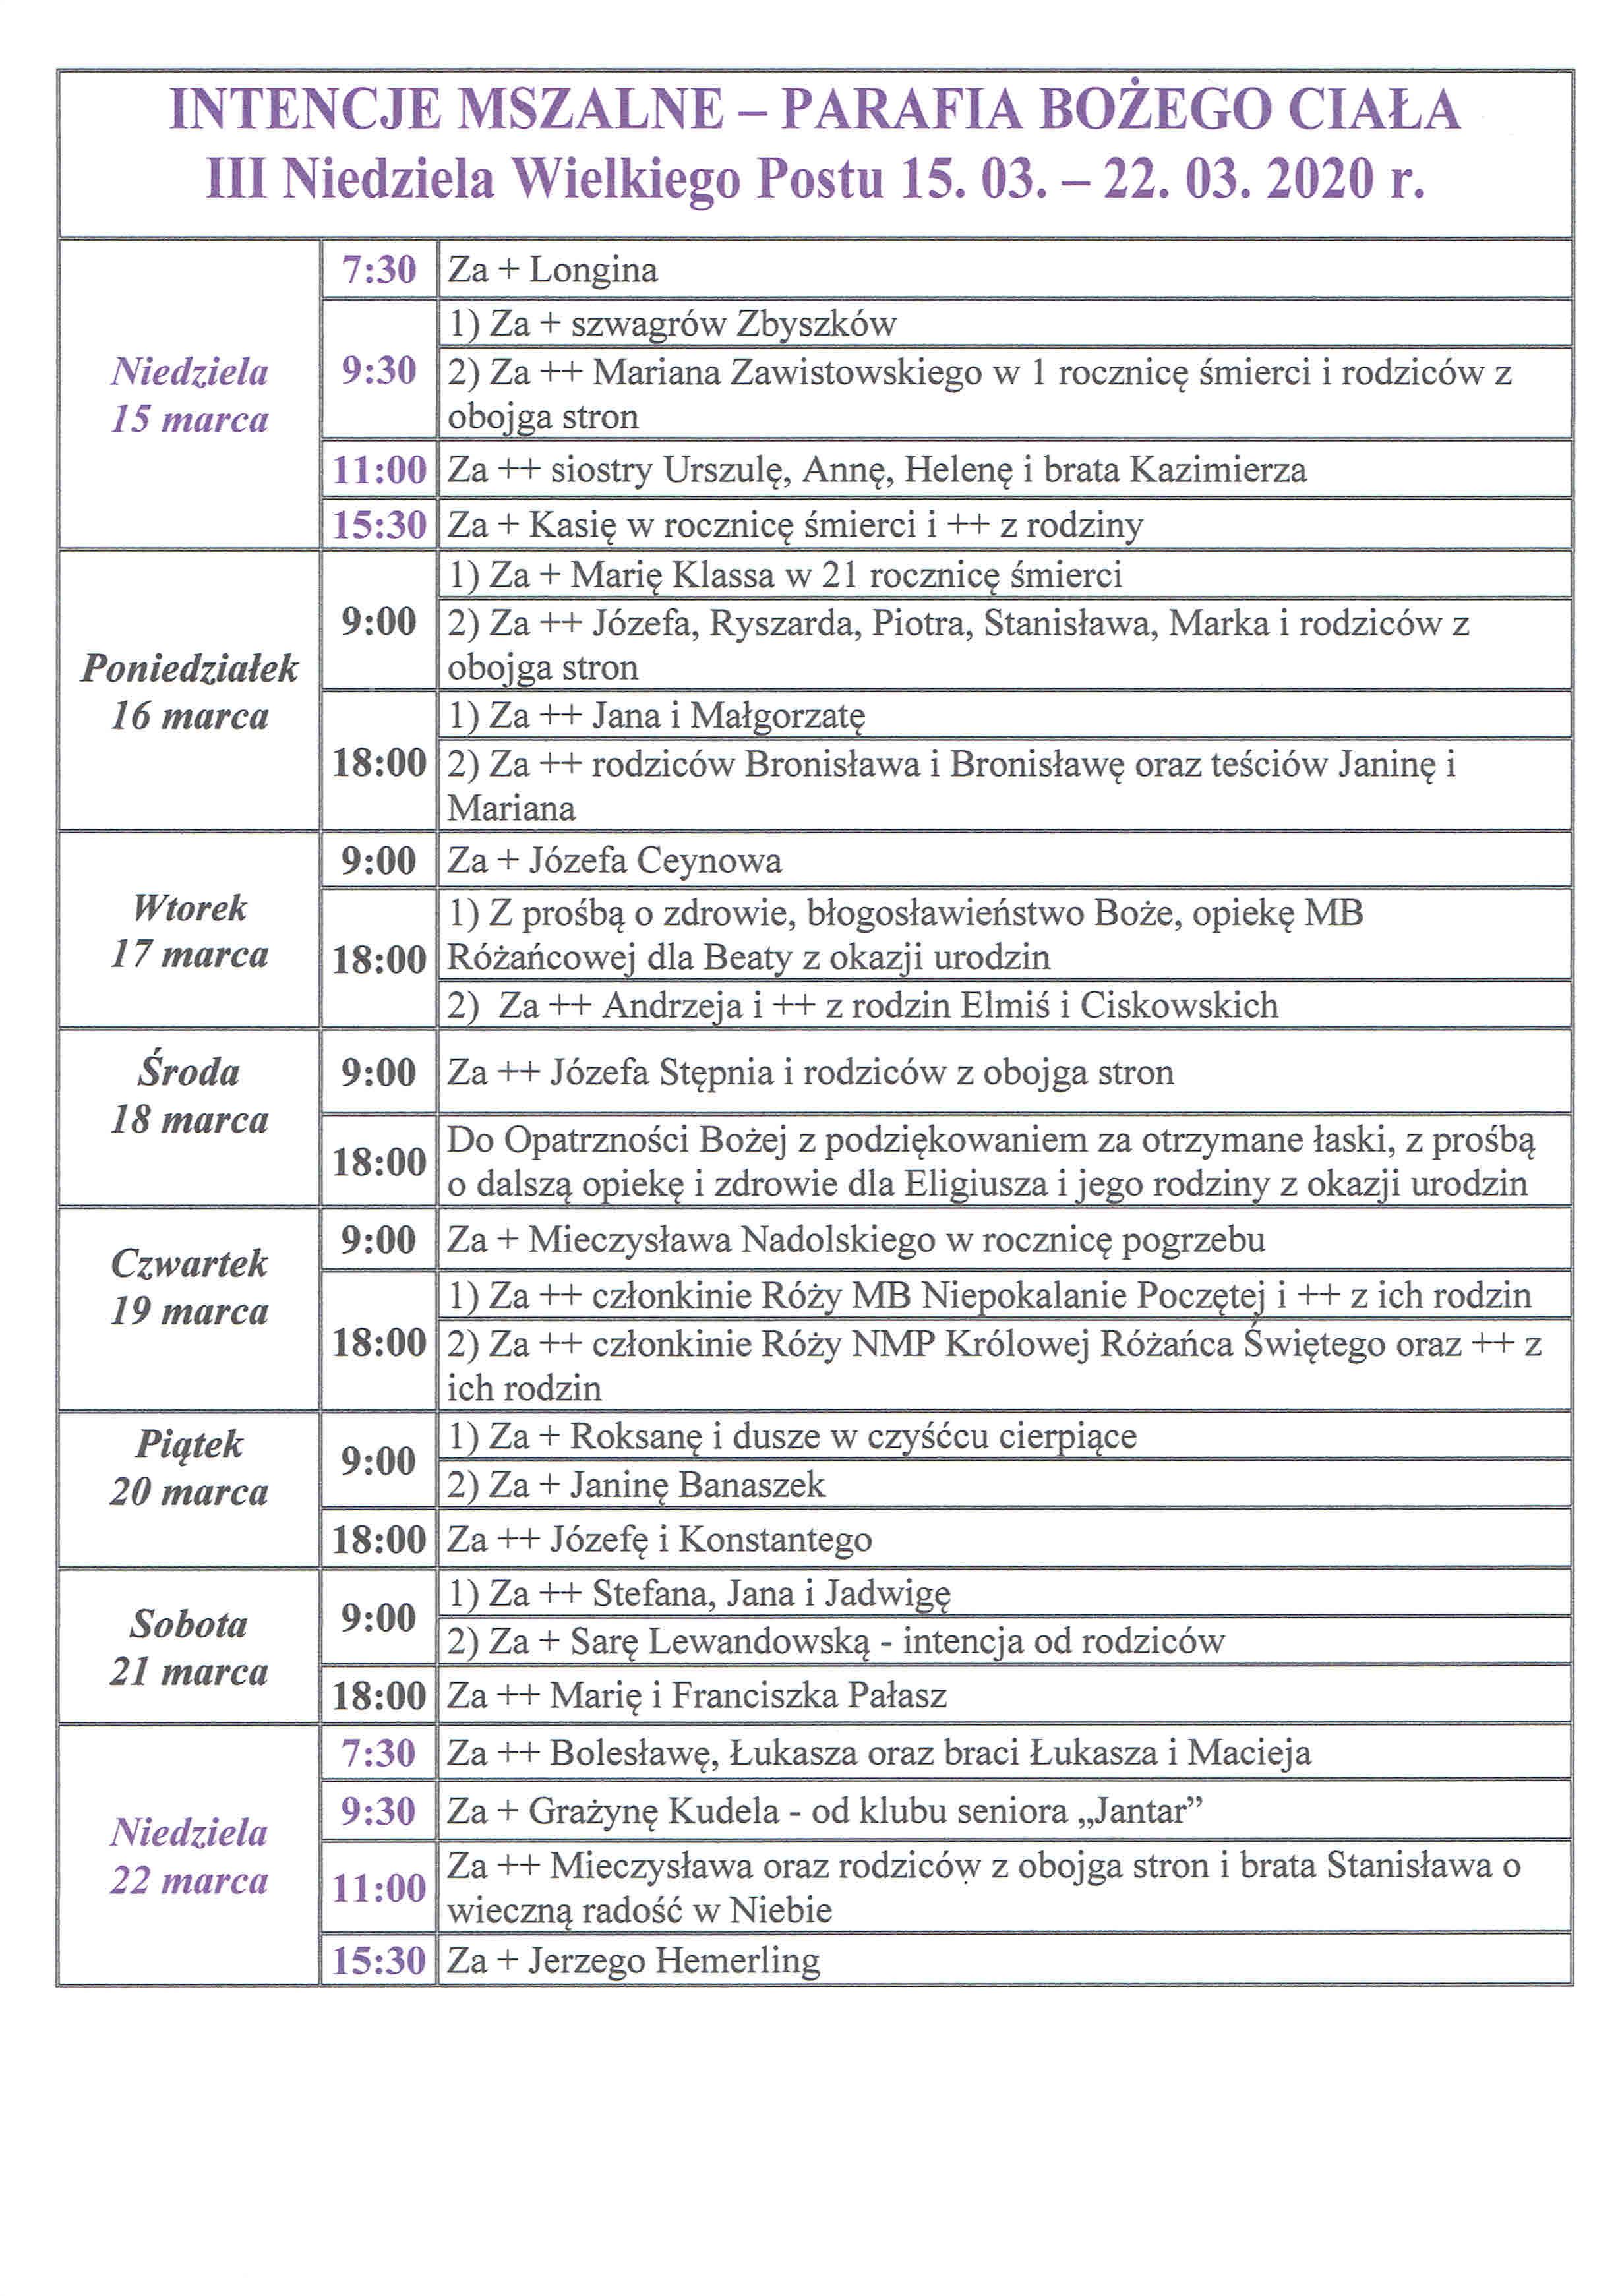 intencje-15-03-2020